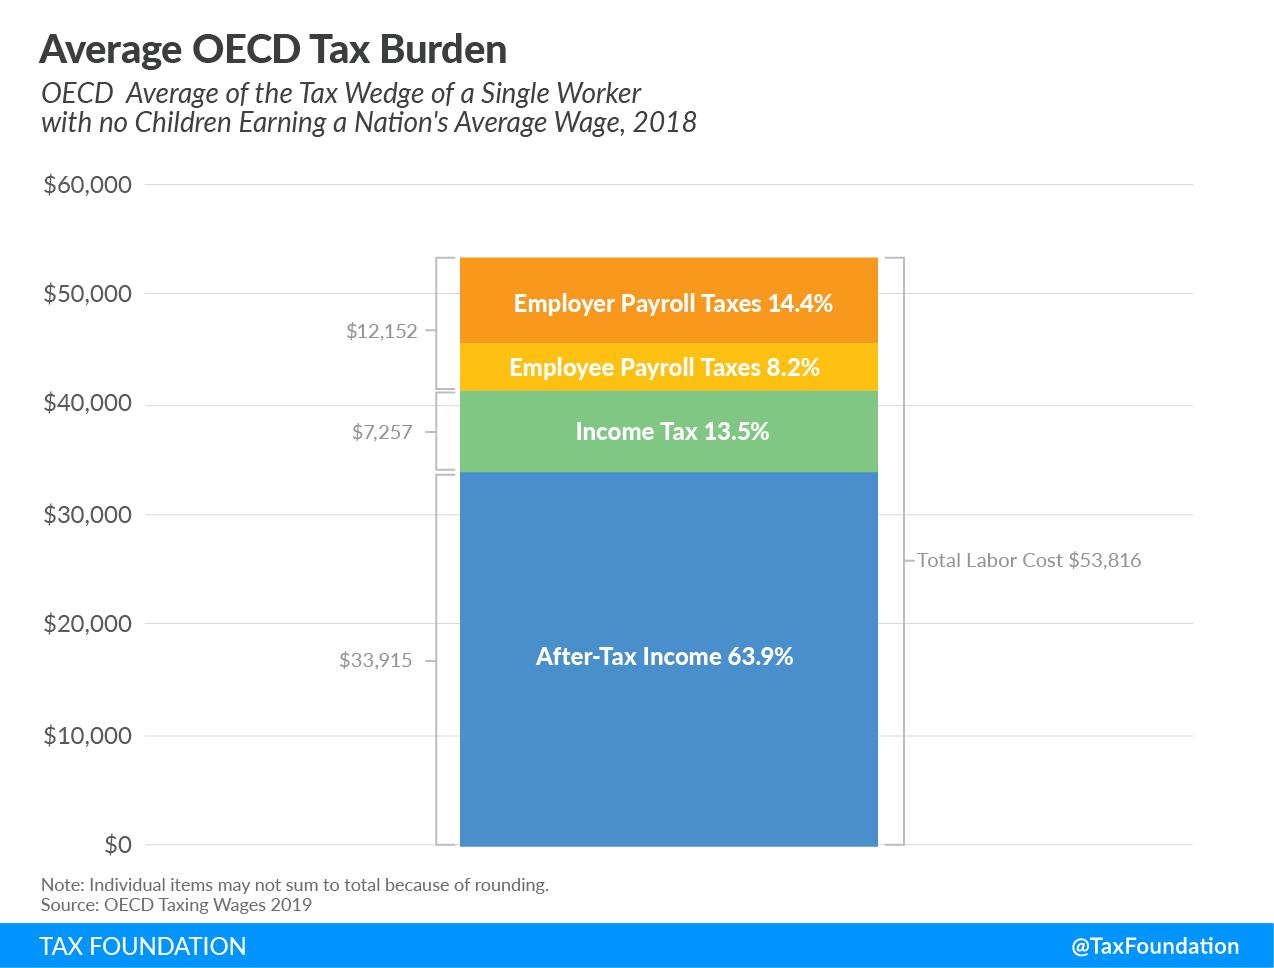 Average OECD Tax Burden, OECD average tax wedge